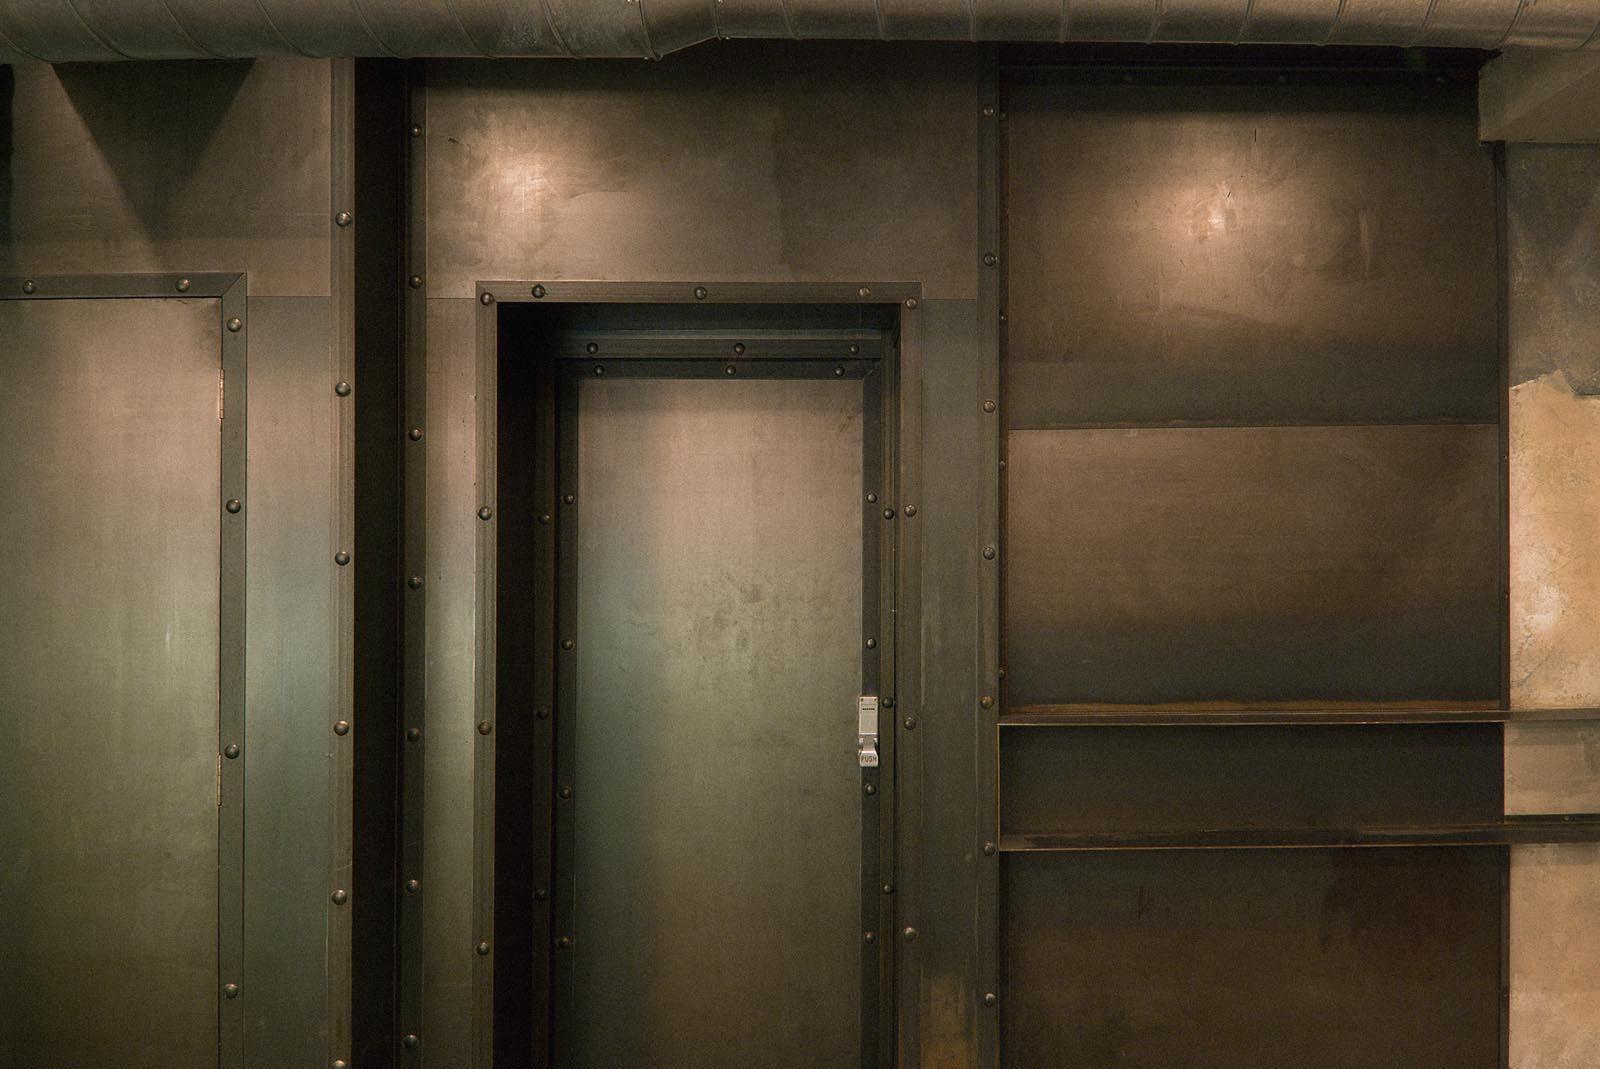 Restaurant Kitchen Doors South Africa